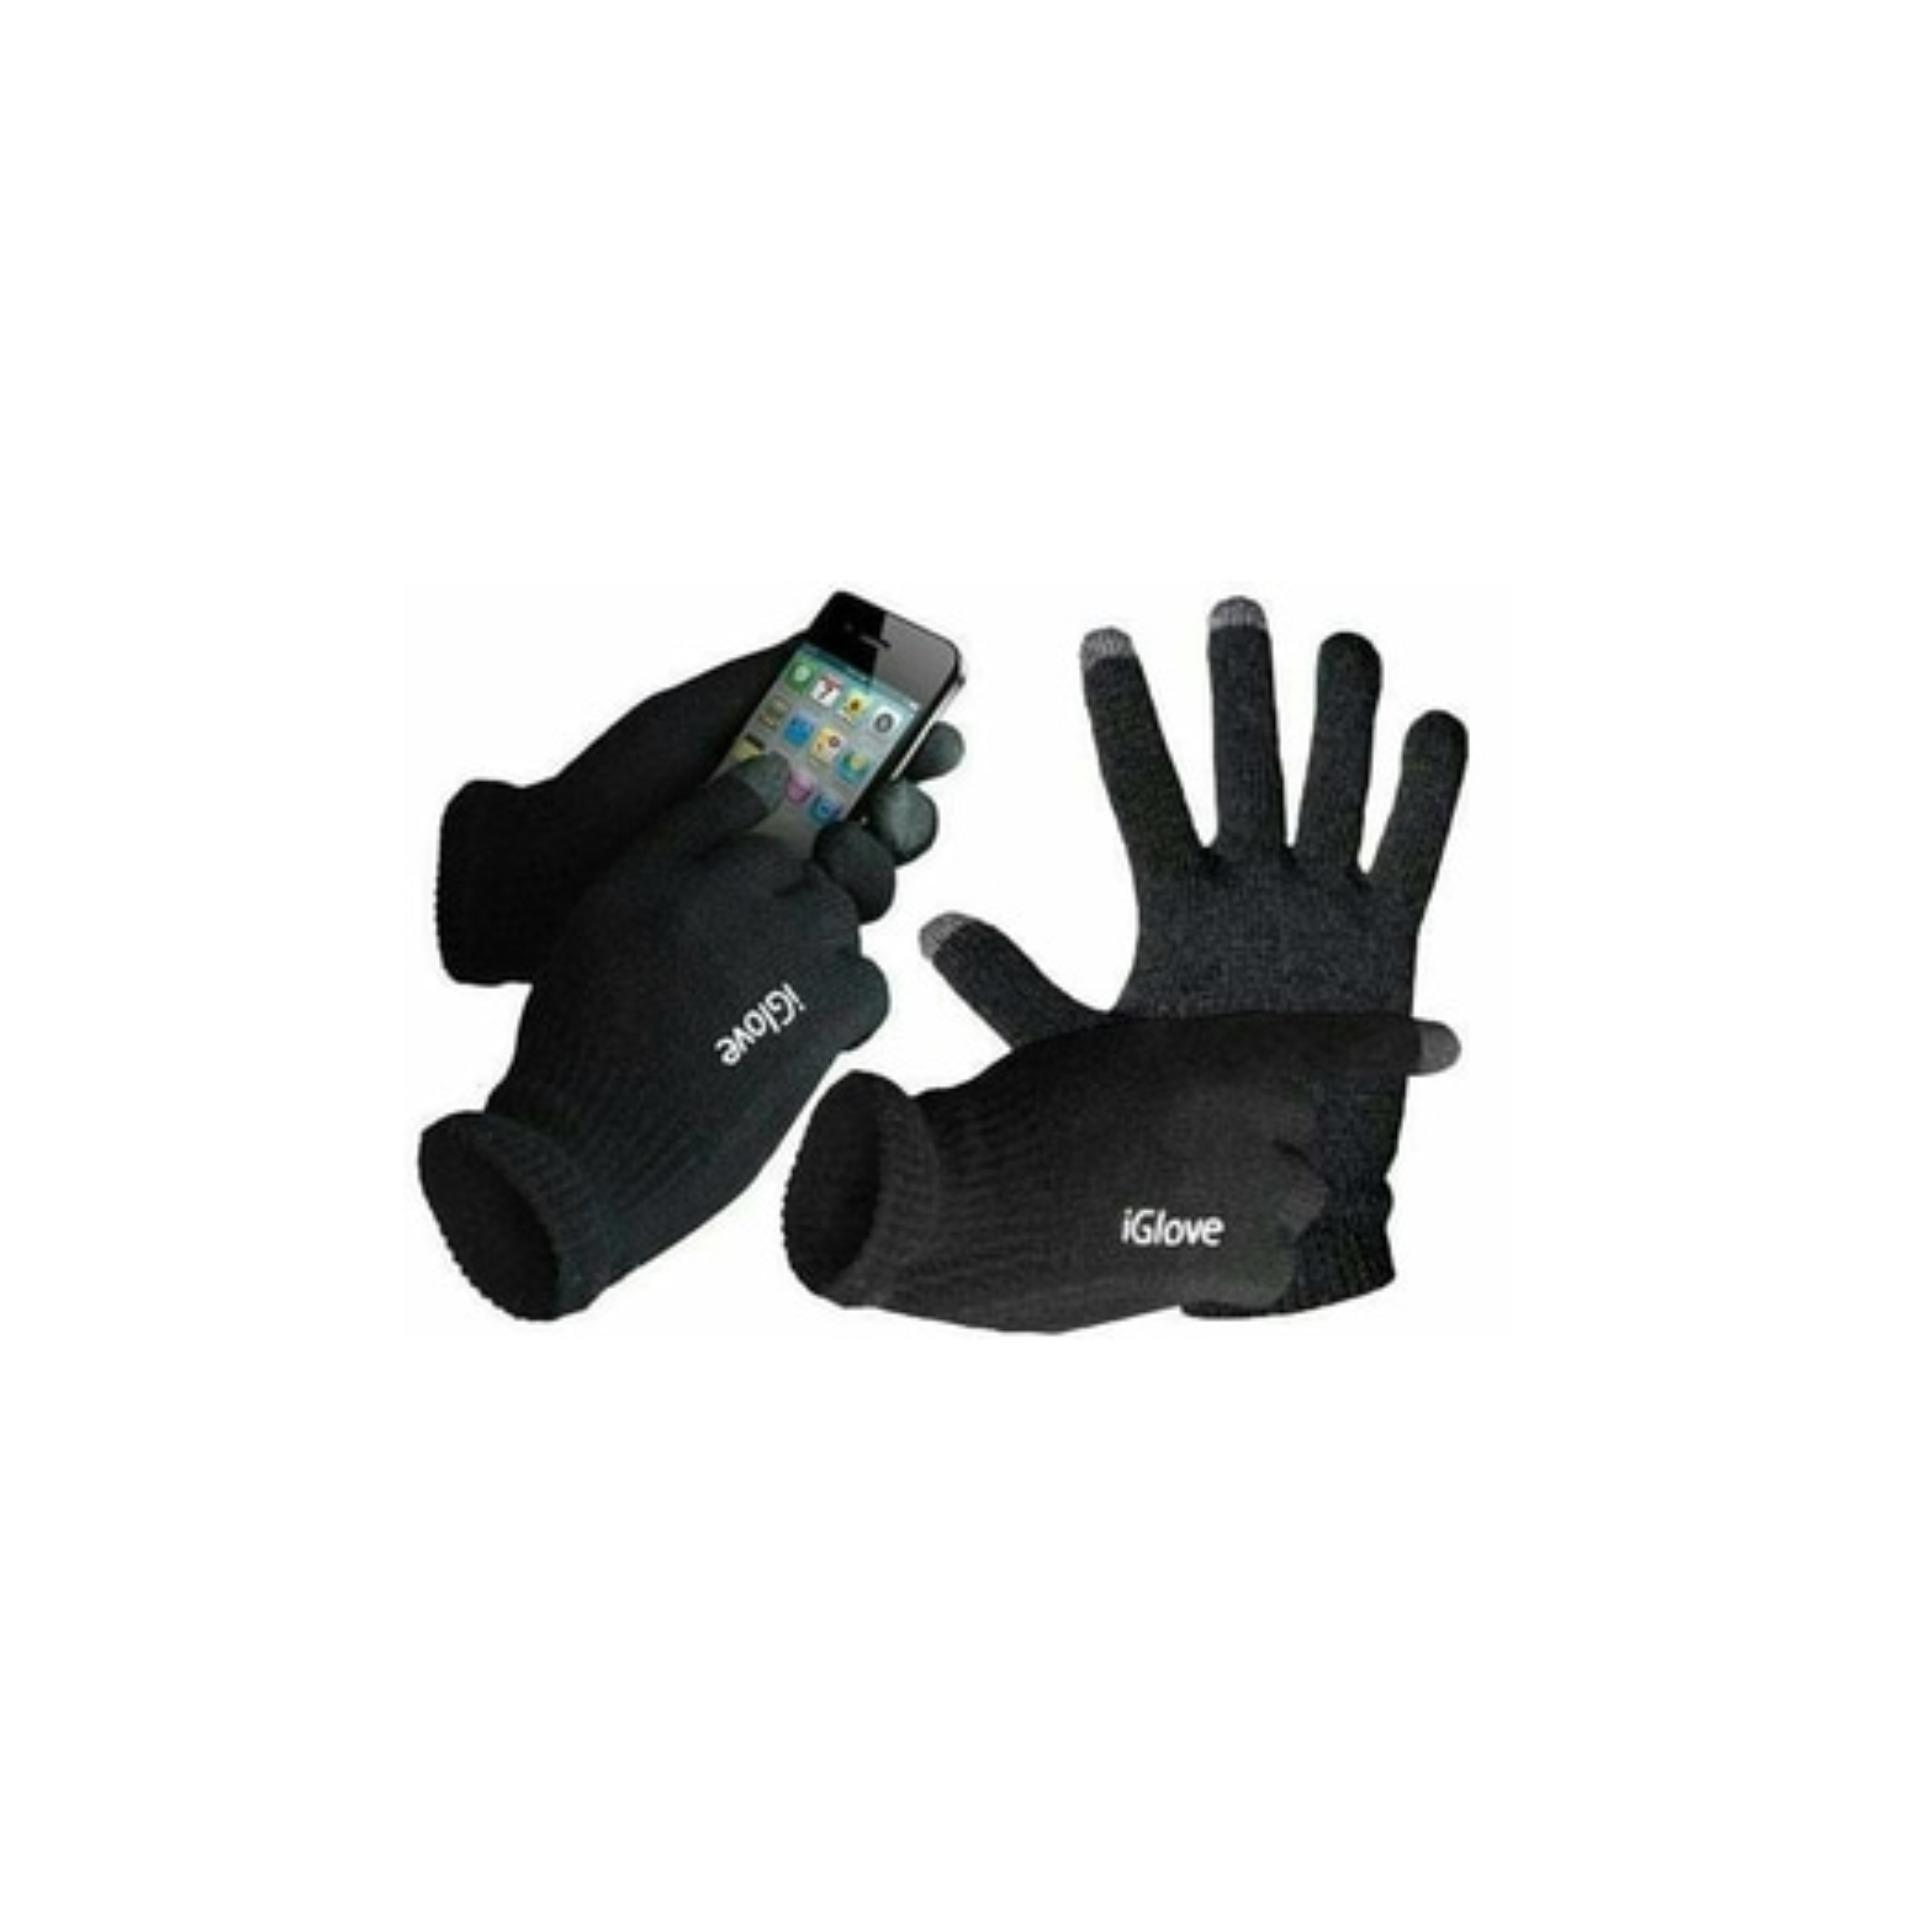 iGlove sarung tangan touch screen Smartphone & Tablet .